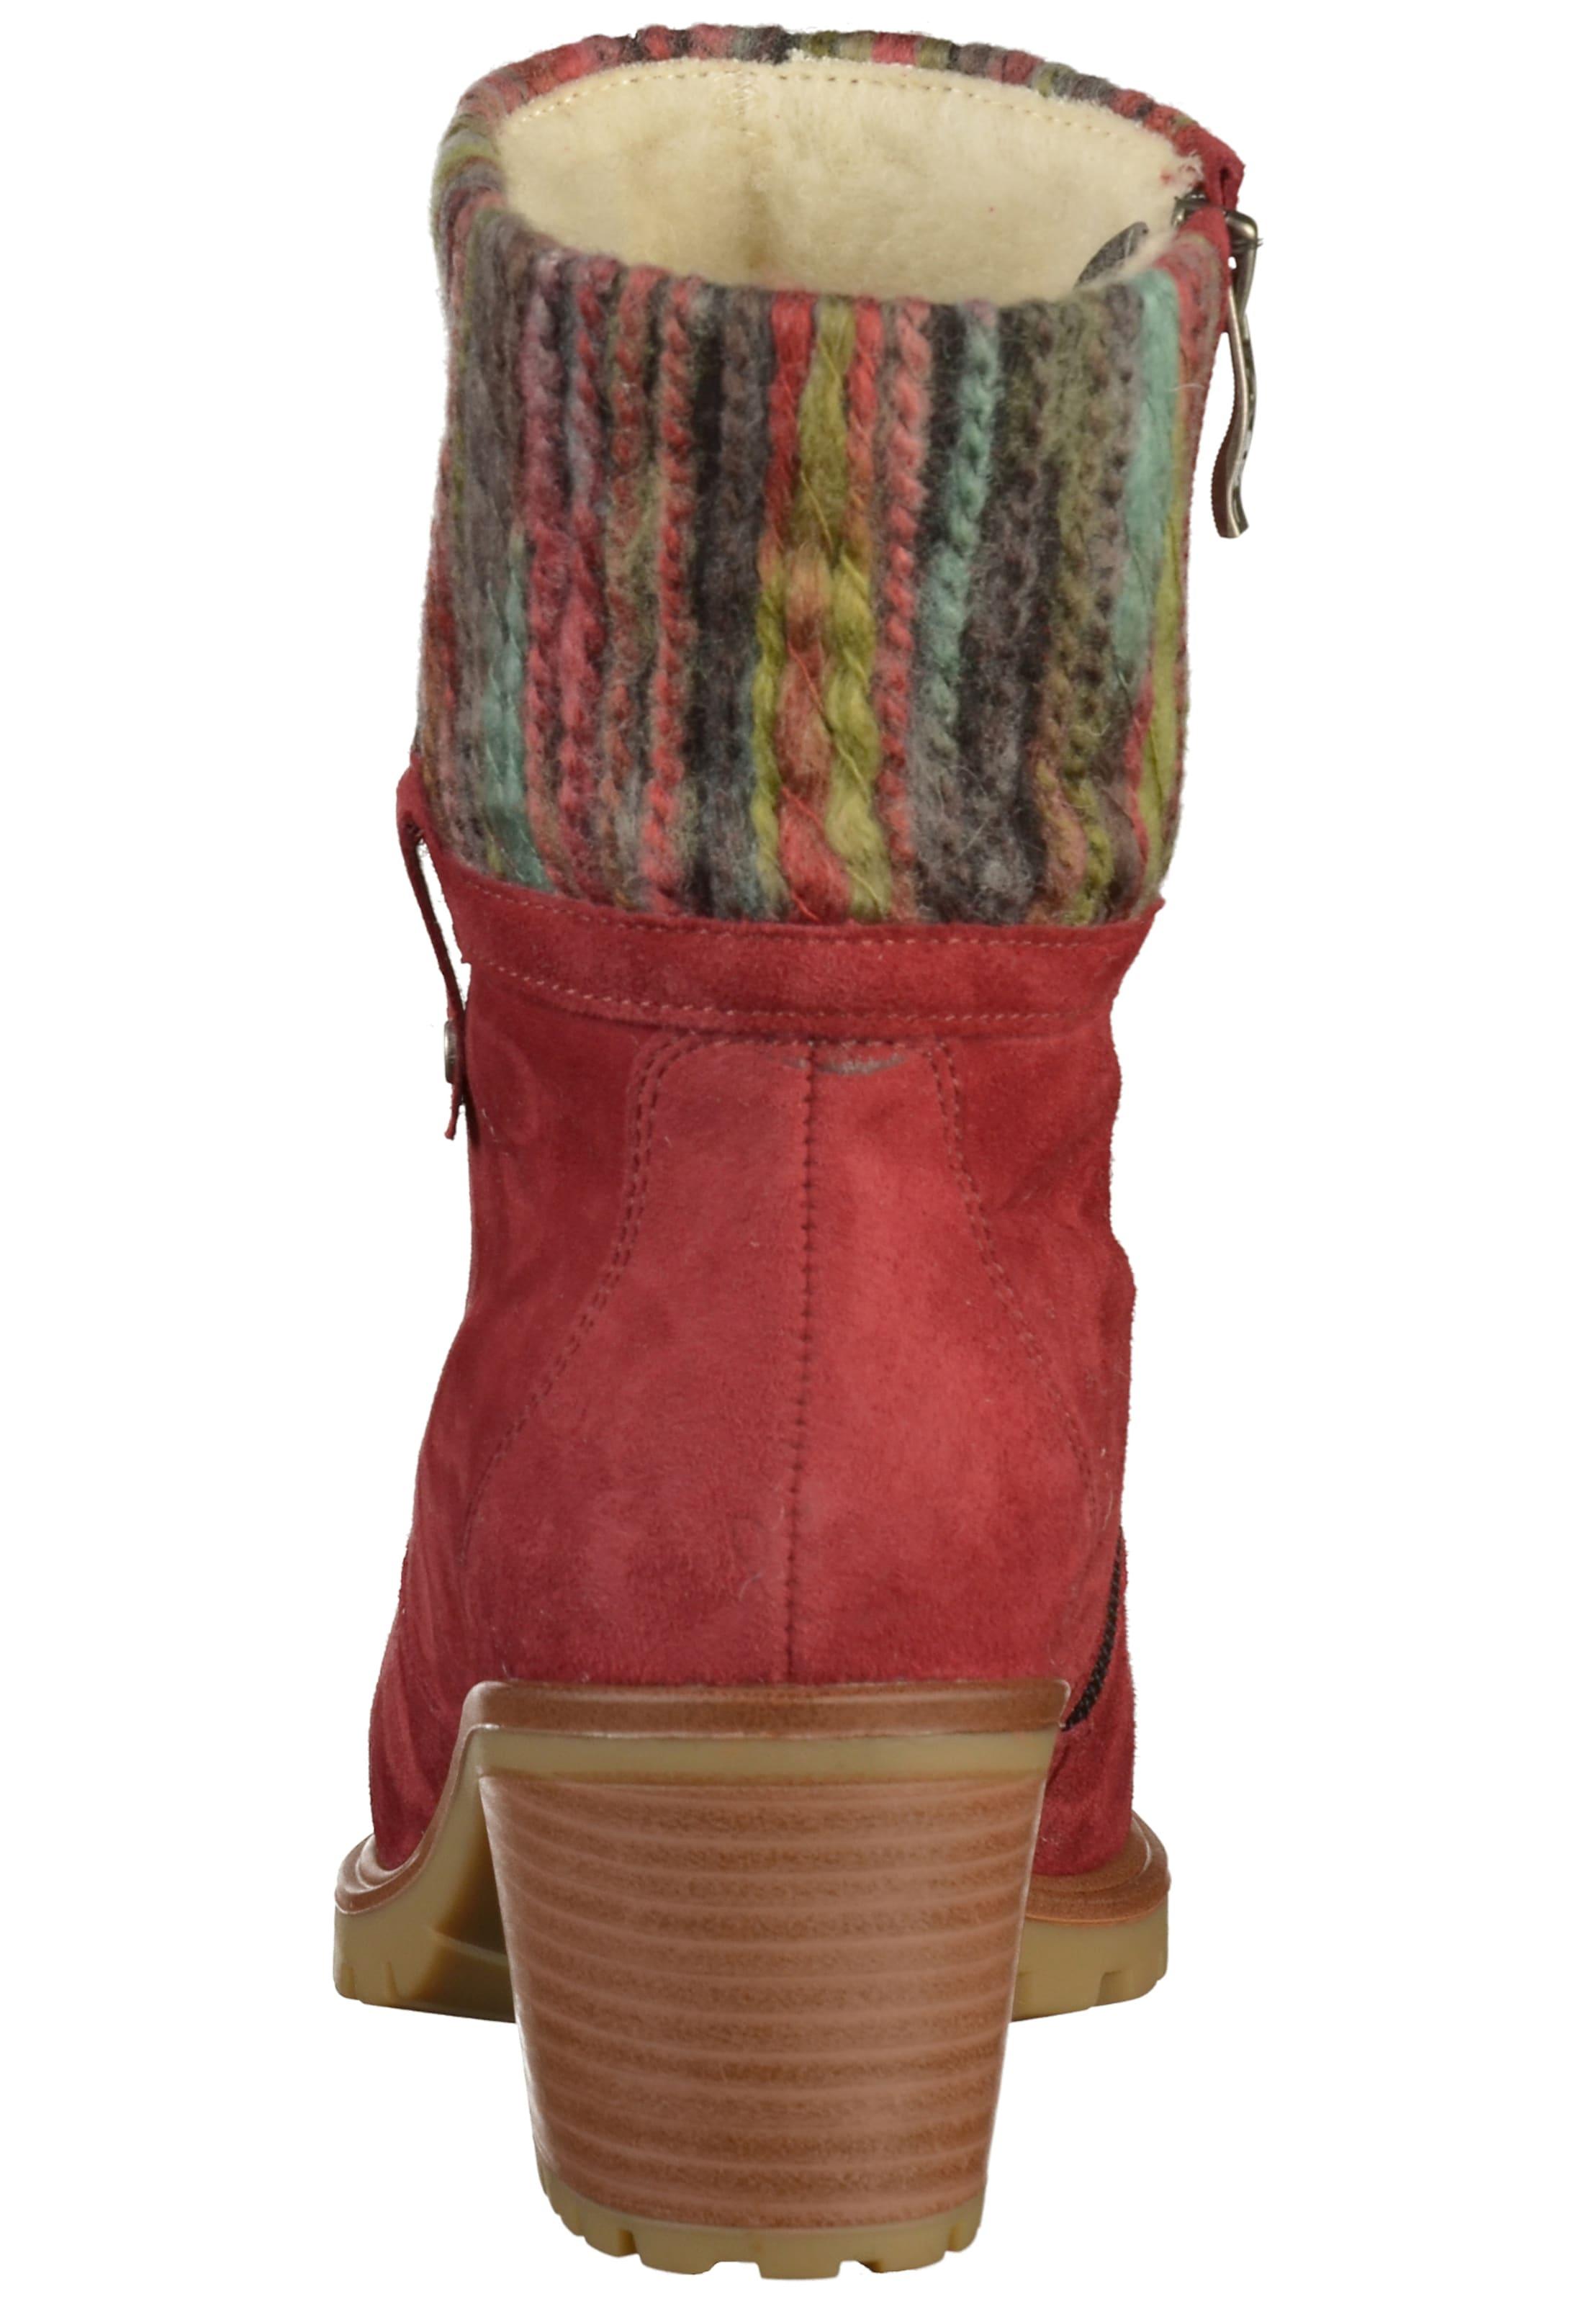 In Jenny Jenny Stiefel MischfarbenRot In MischfarbenRot Stiefel eHbYWED29I